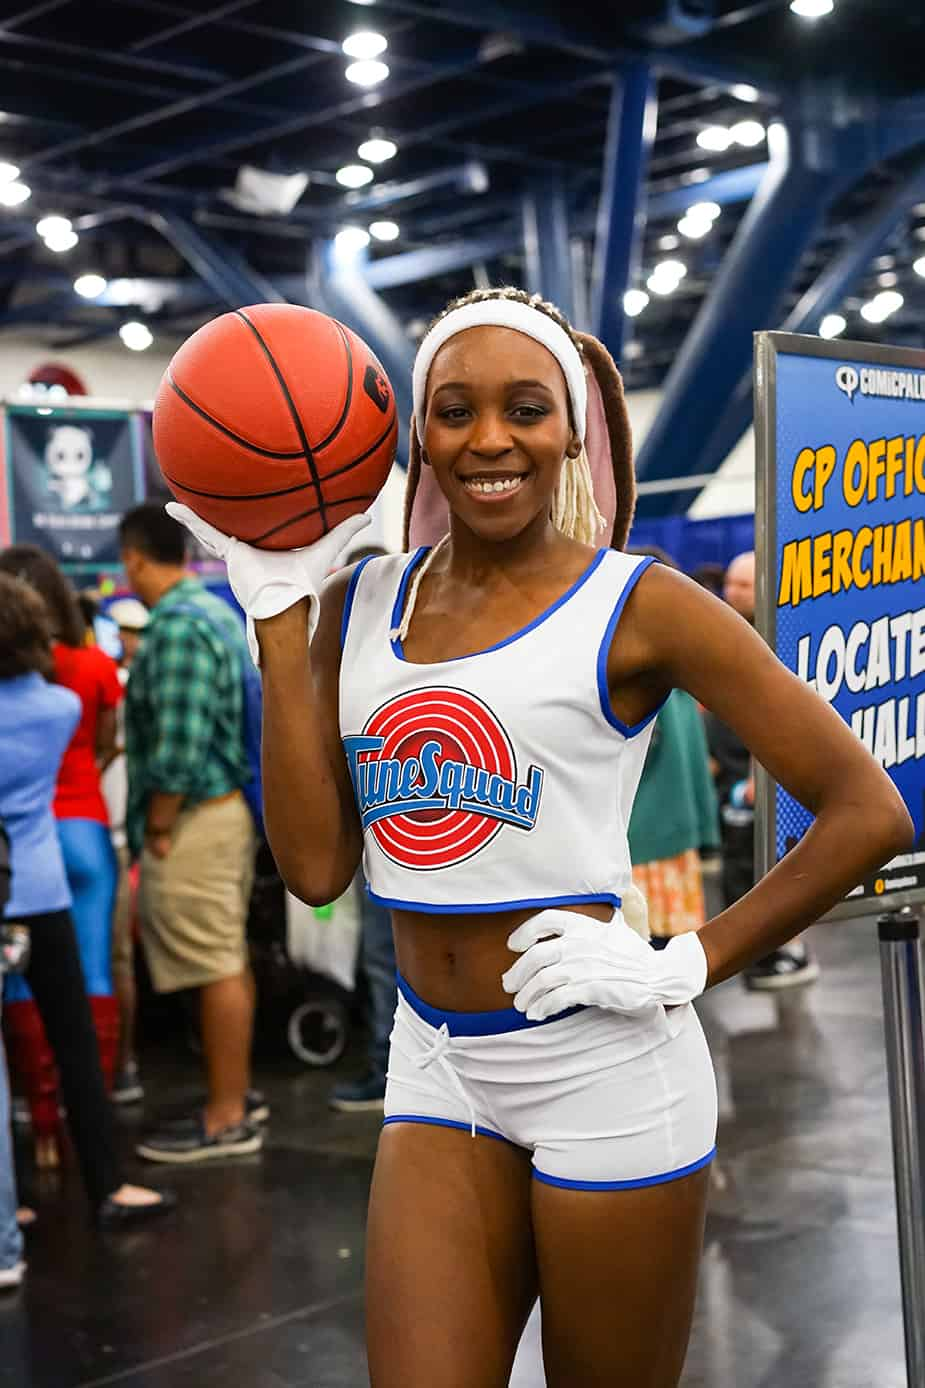 Lola Bunny Space Jam African American Cosplay Comicpalooza